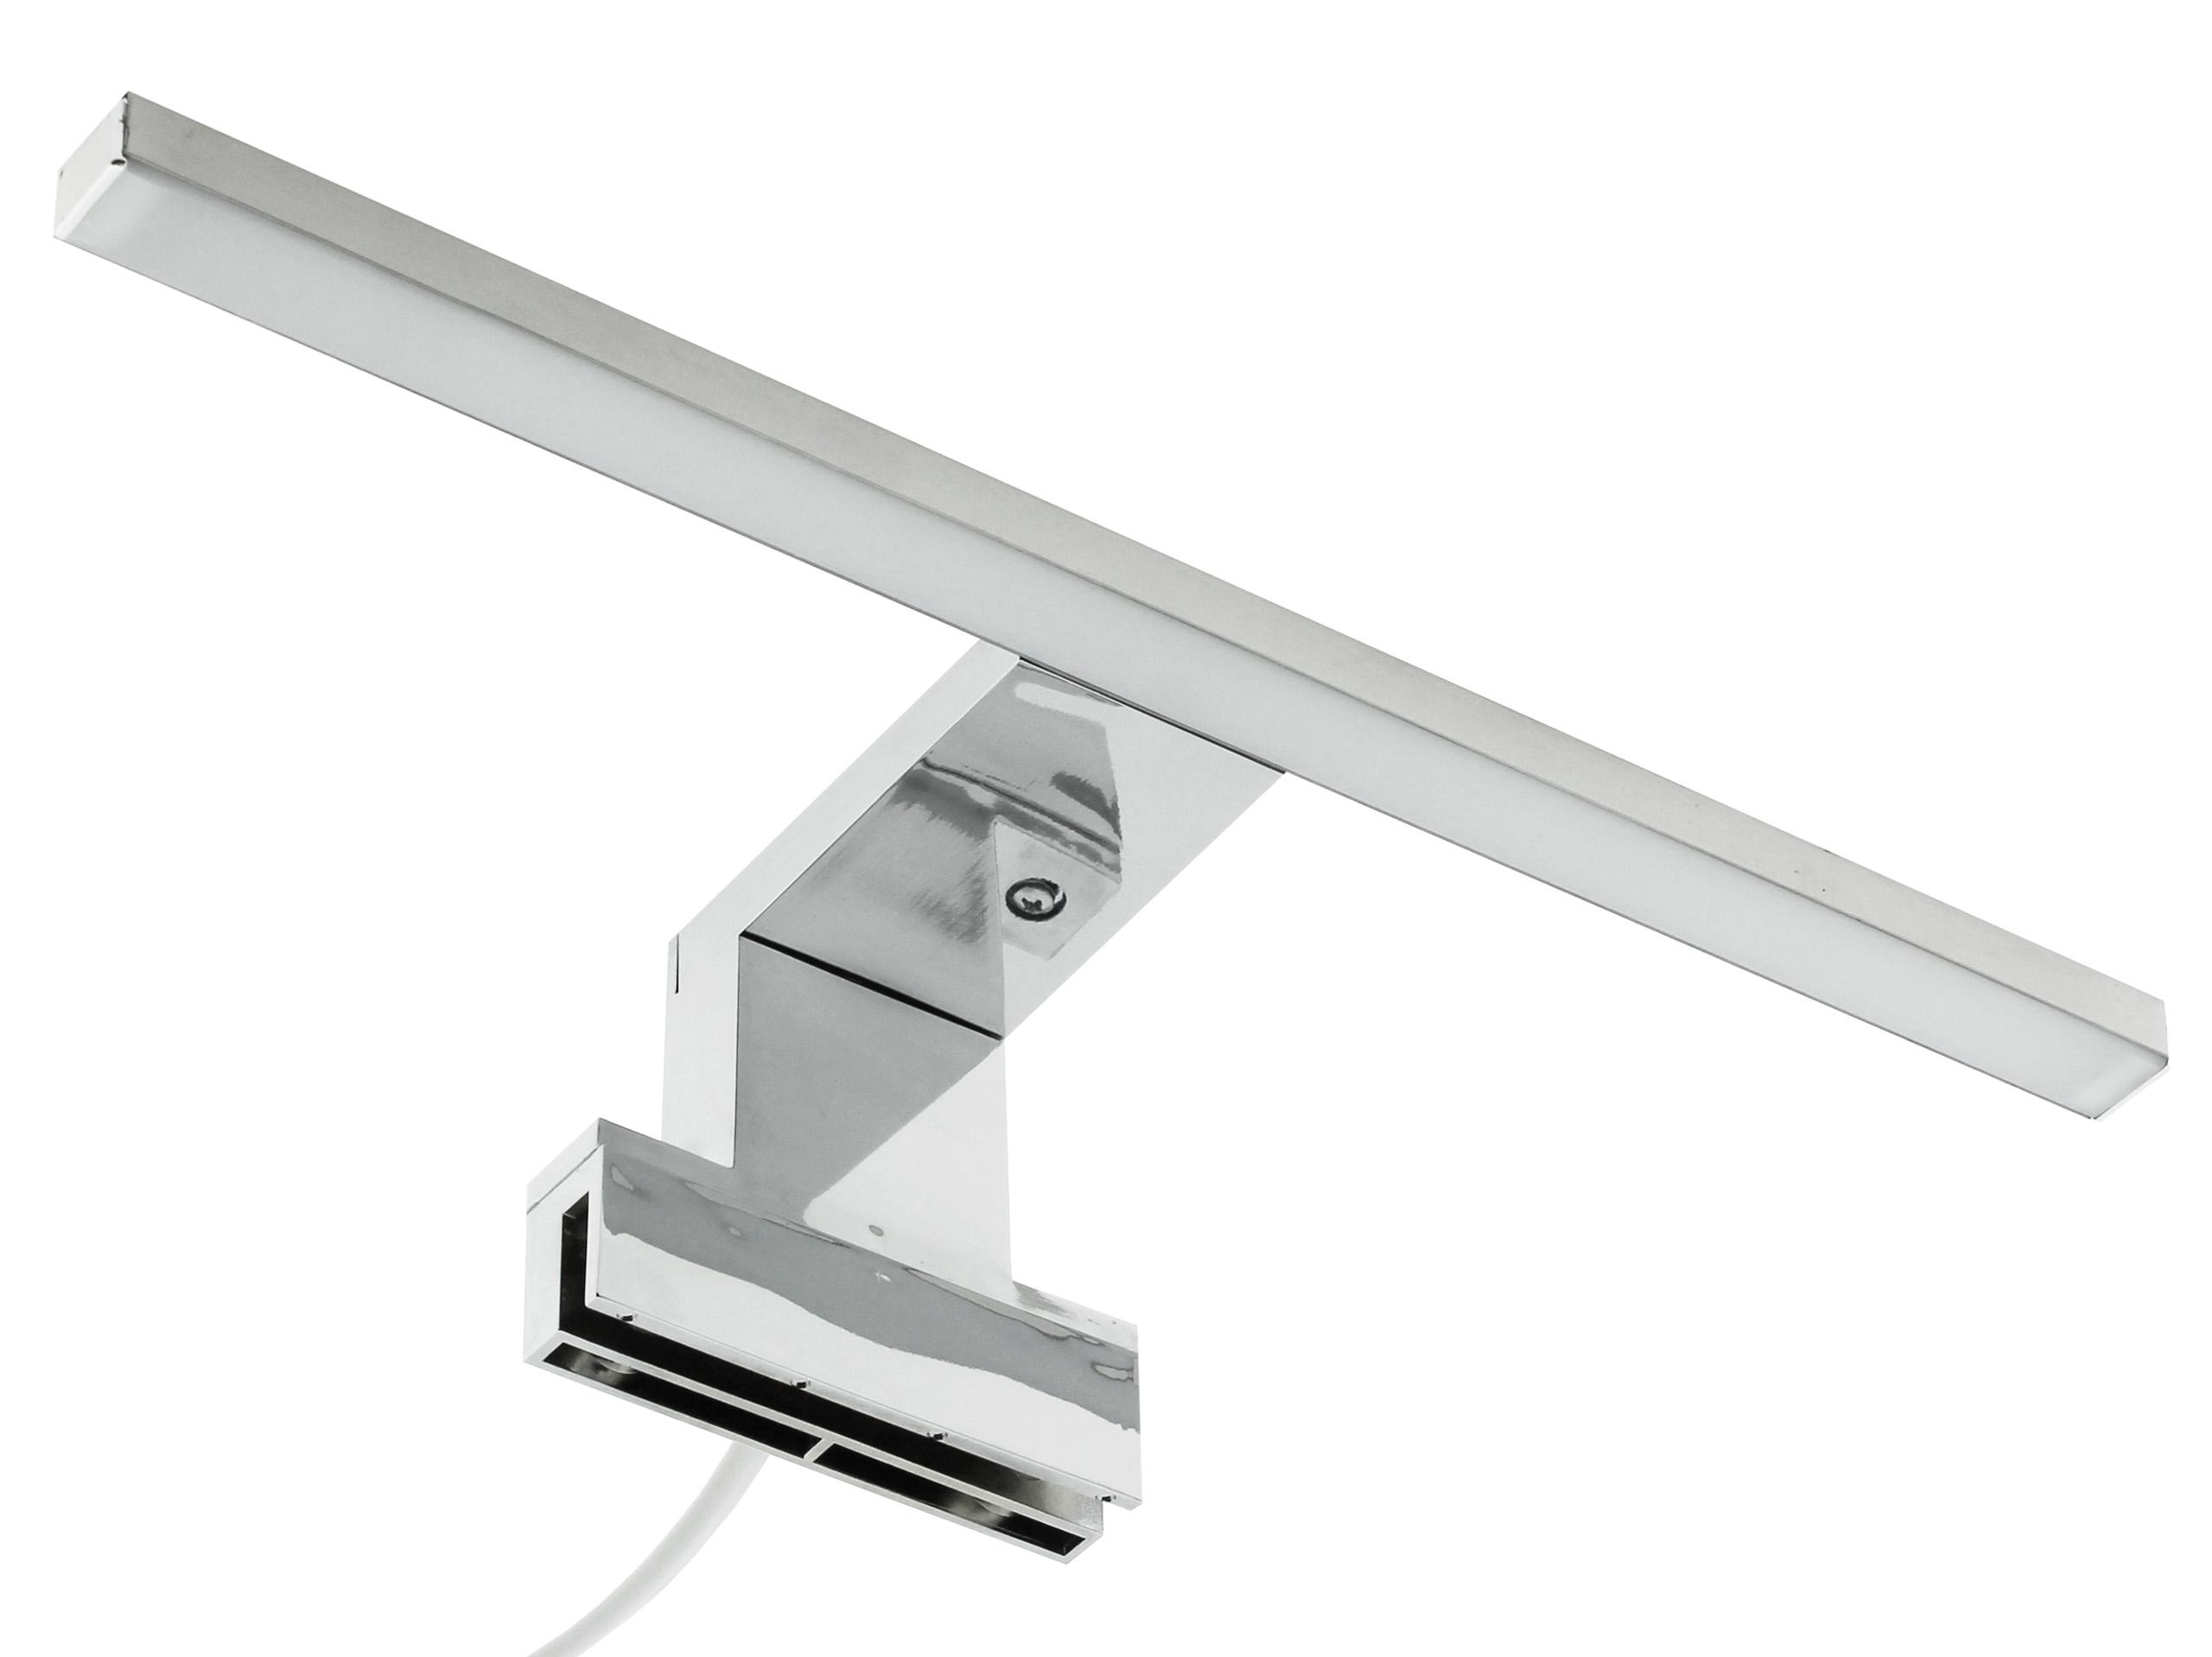 Furnika LED Lampa ALA 400 Furnika Barva: aluminium